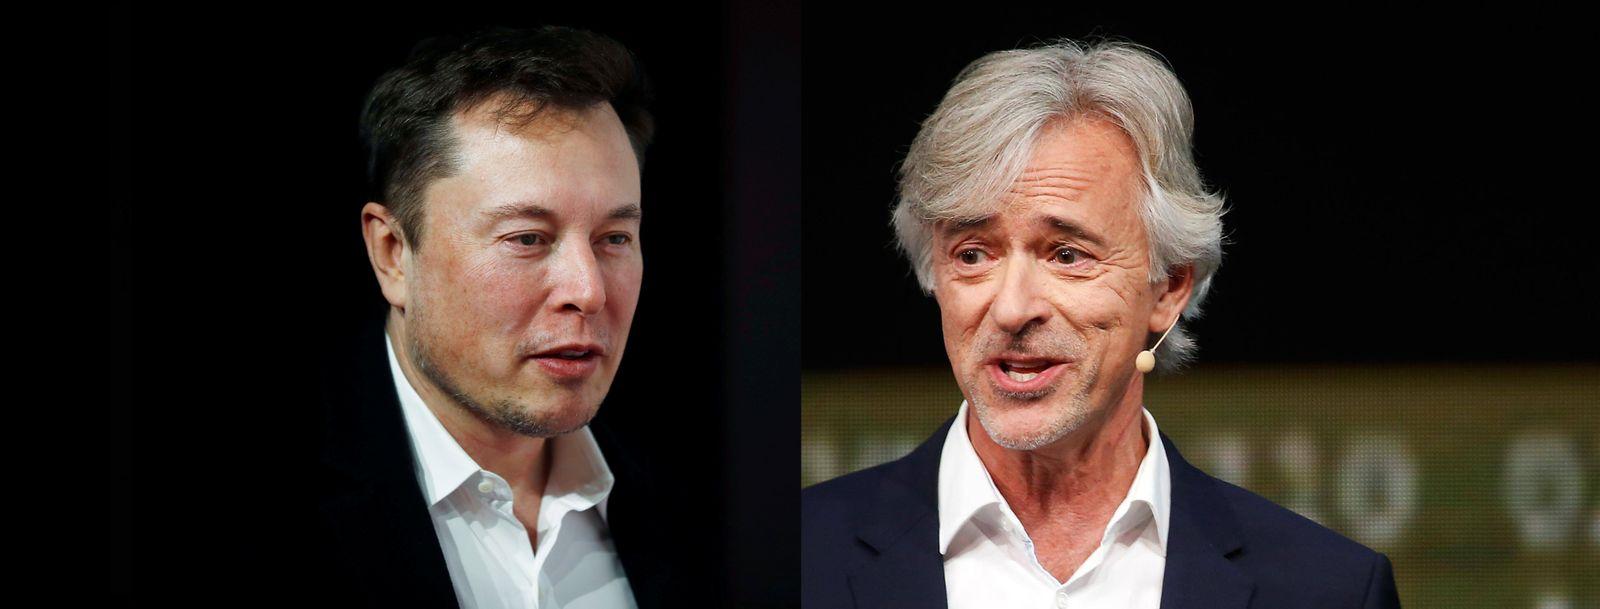 KOMBO Elon Musk / John Krafcik